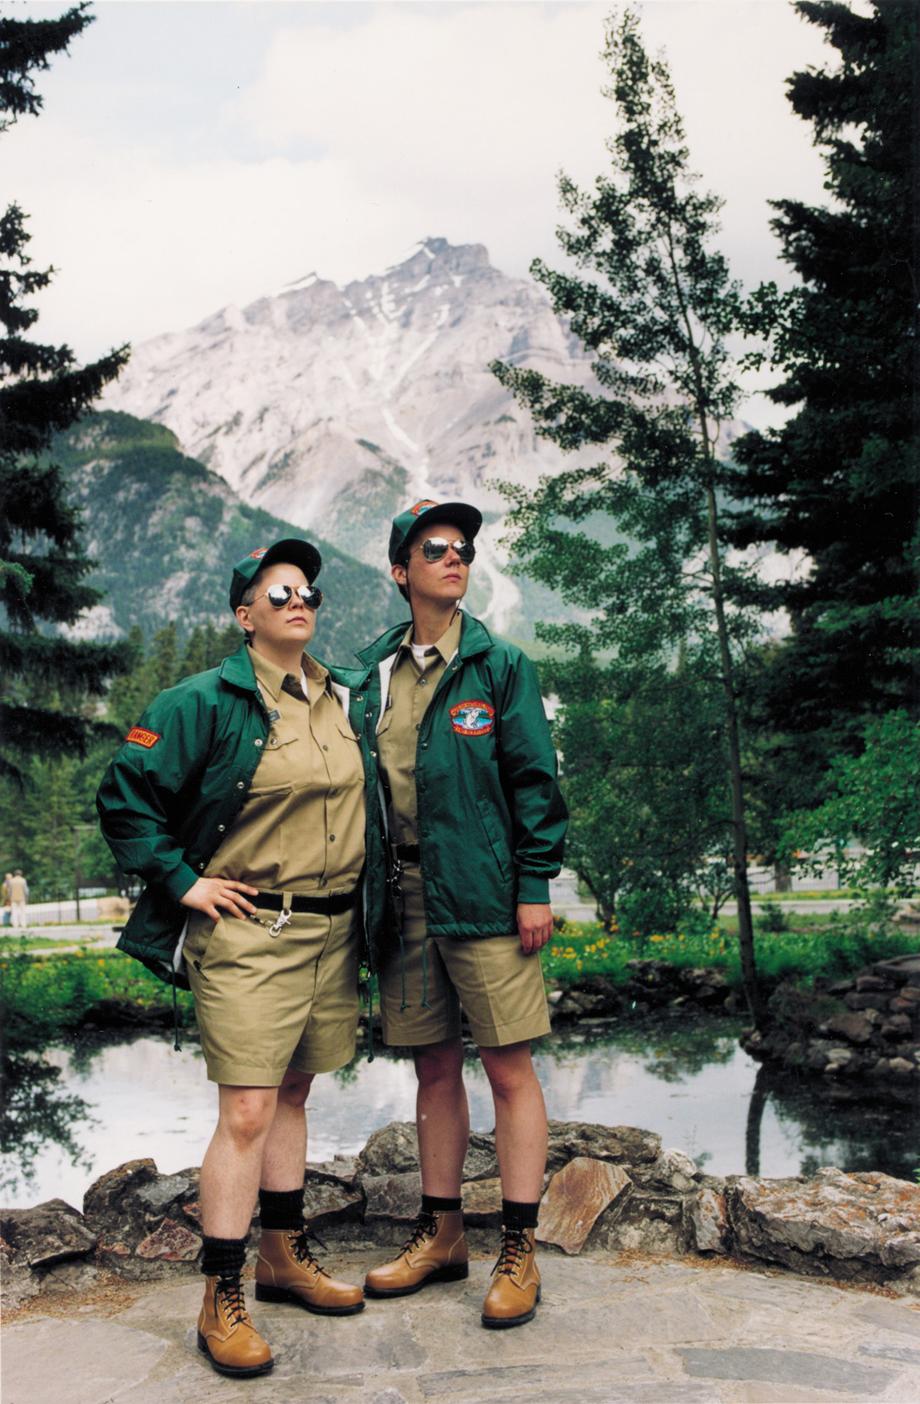 Shawna Dempsey and Lorri Millan, Forrest Guards, 1997